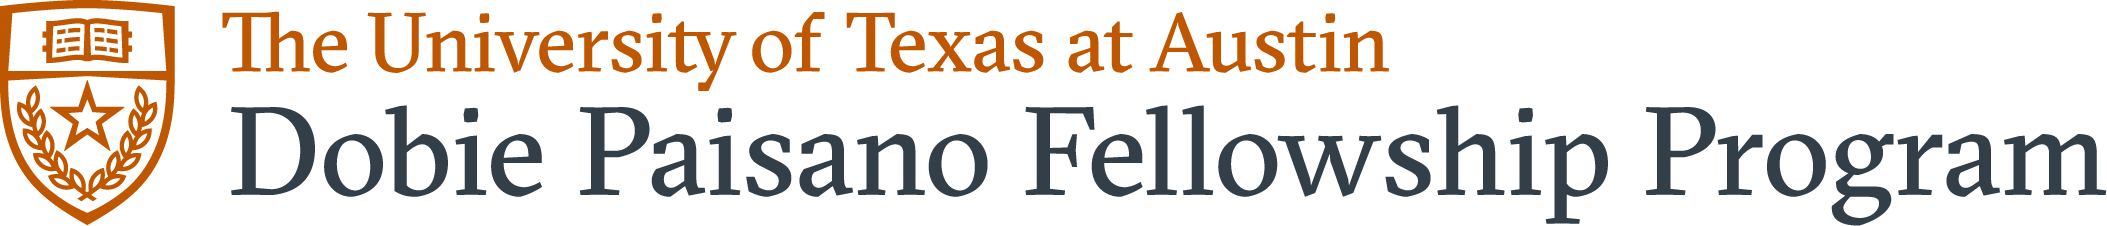 Dobie Paisano Fellowship logo